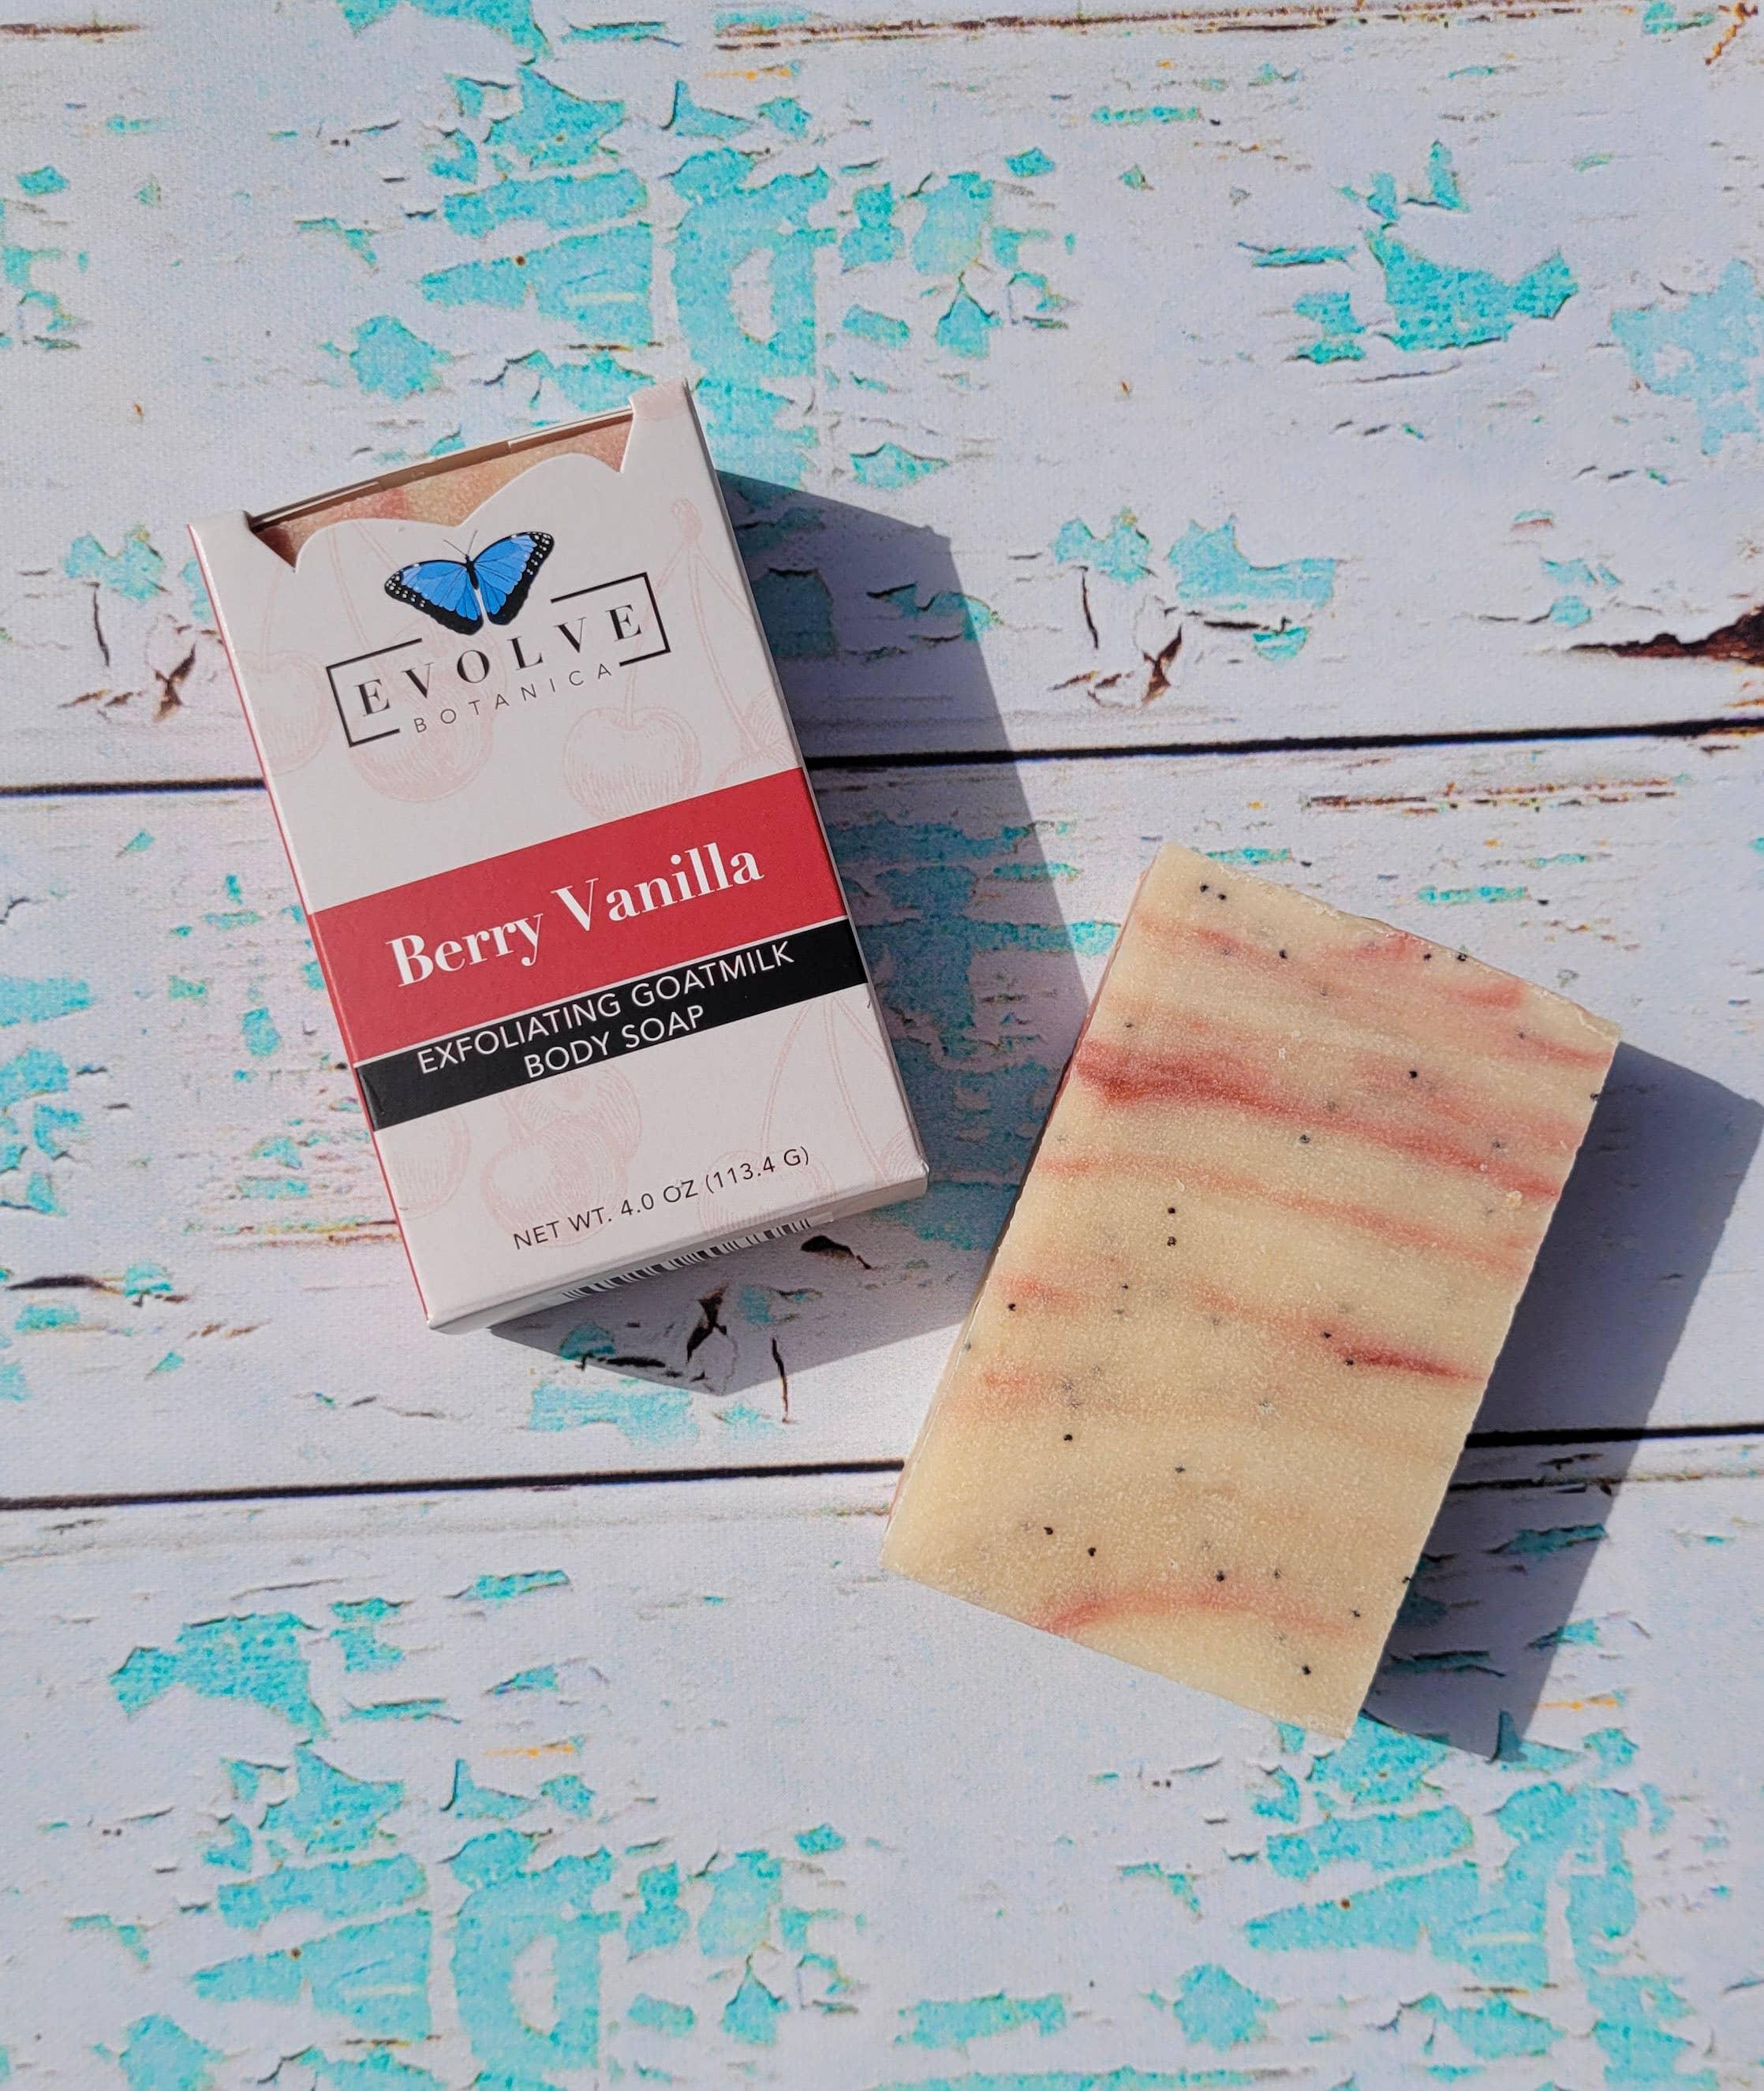 Evolve - Standard Soap - Berry Vanilla (Goatmilk) | Trada Marketplace